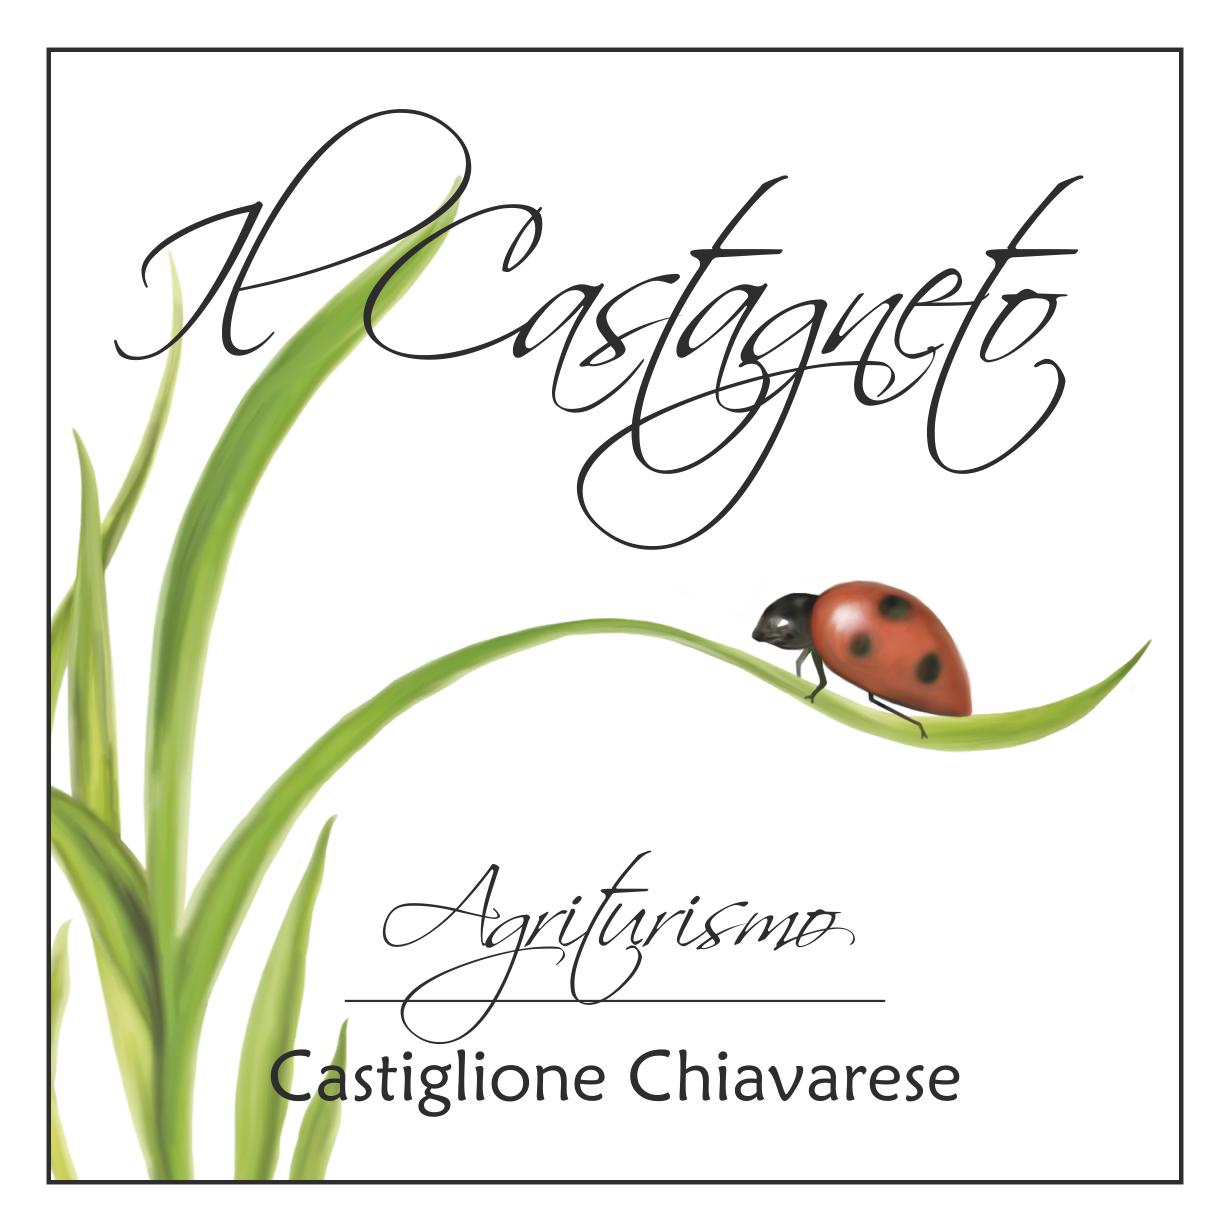 Agriturismo Il Castagneto